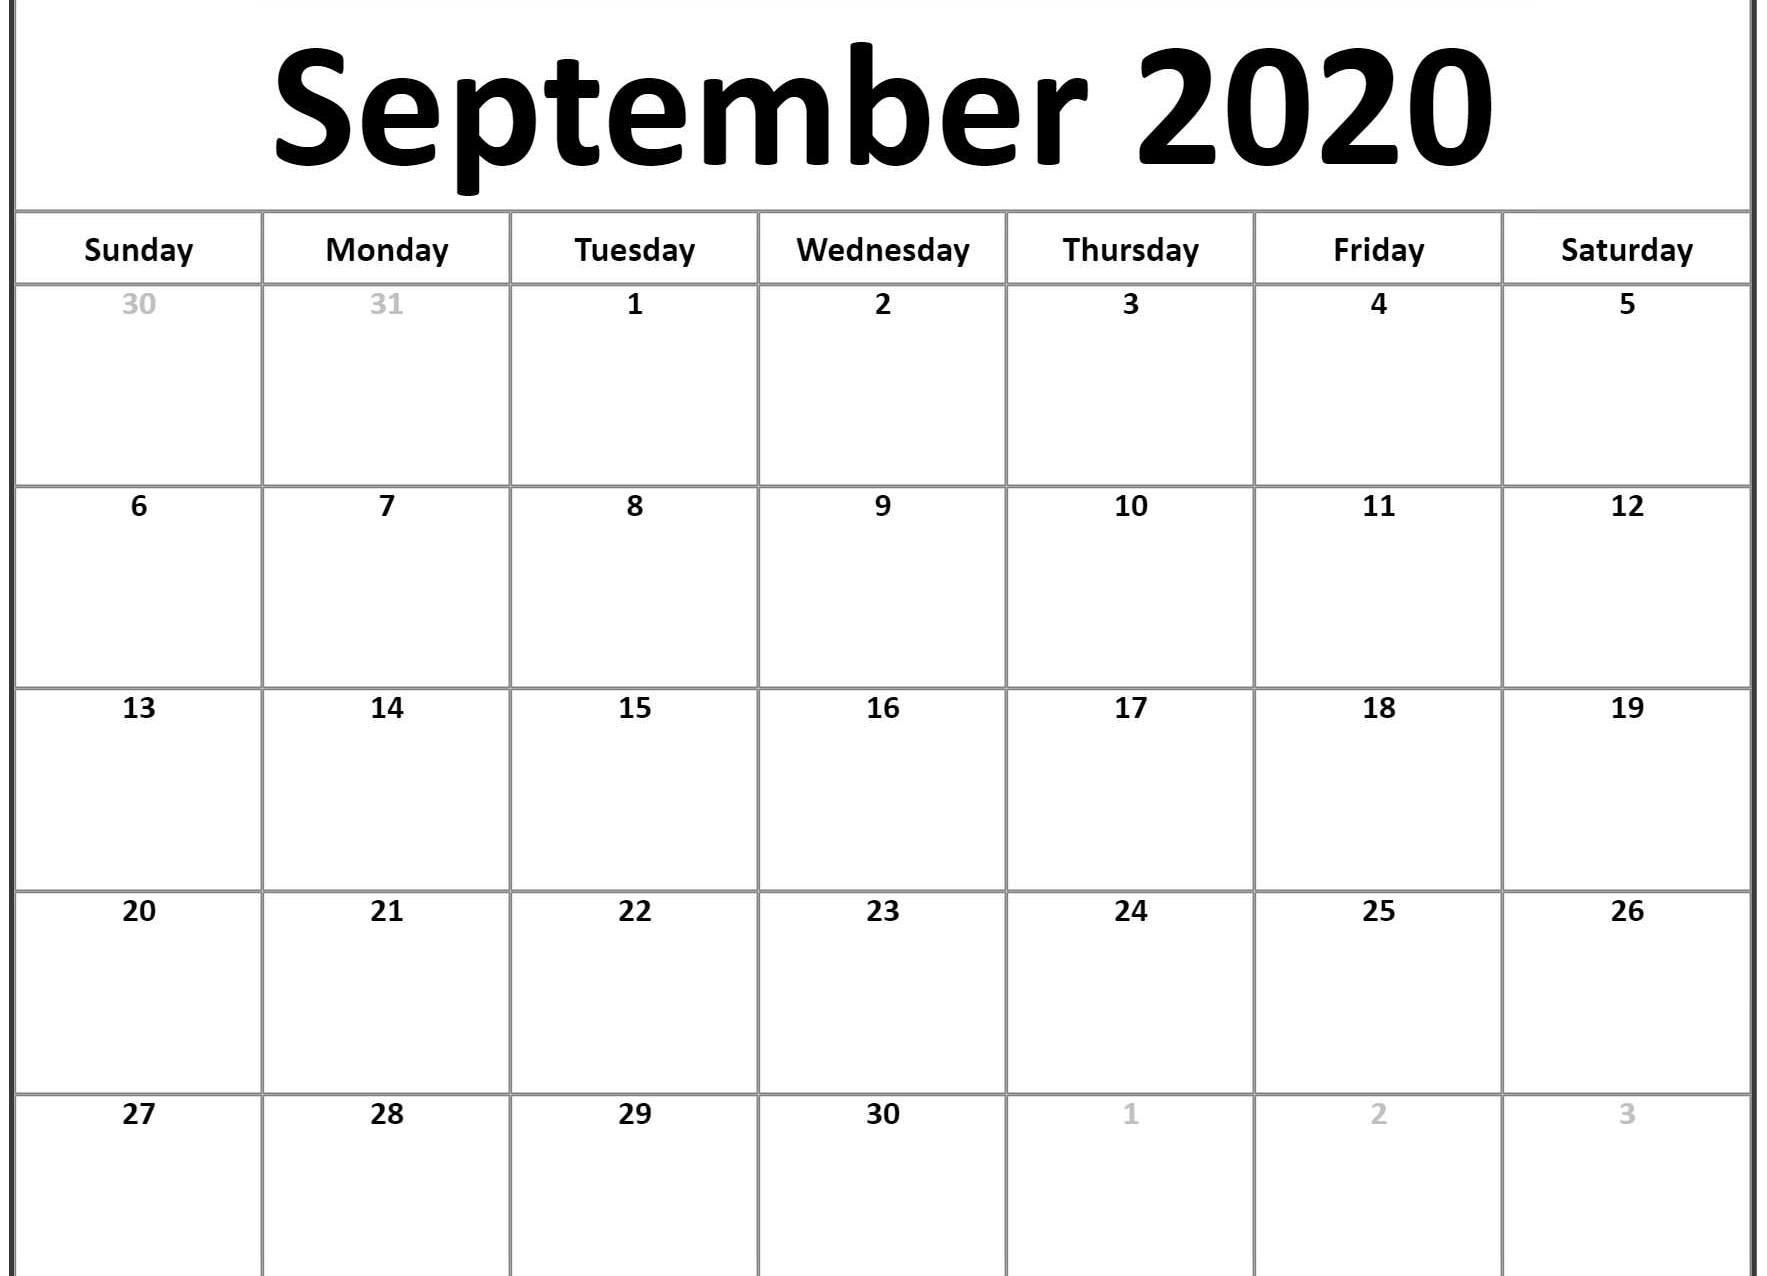 September 2020 Calendar Template In 2019 | Calendar Word